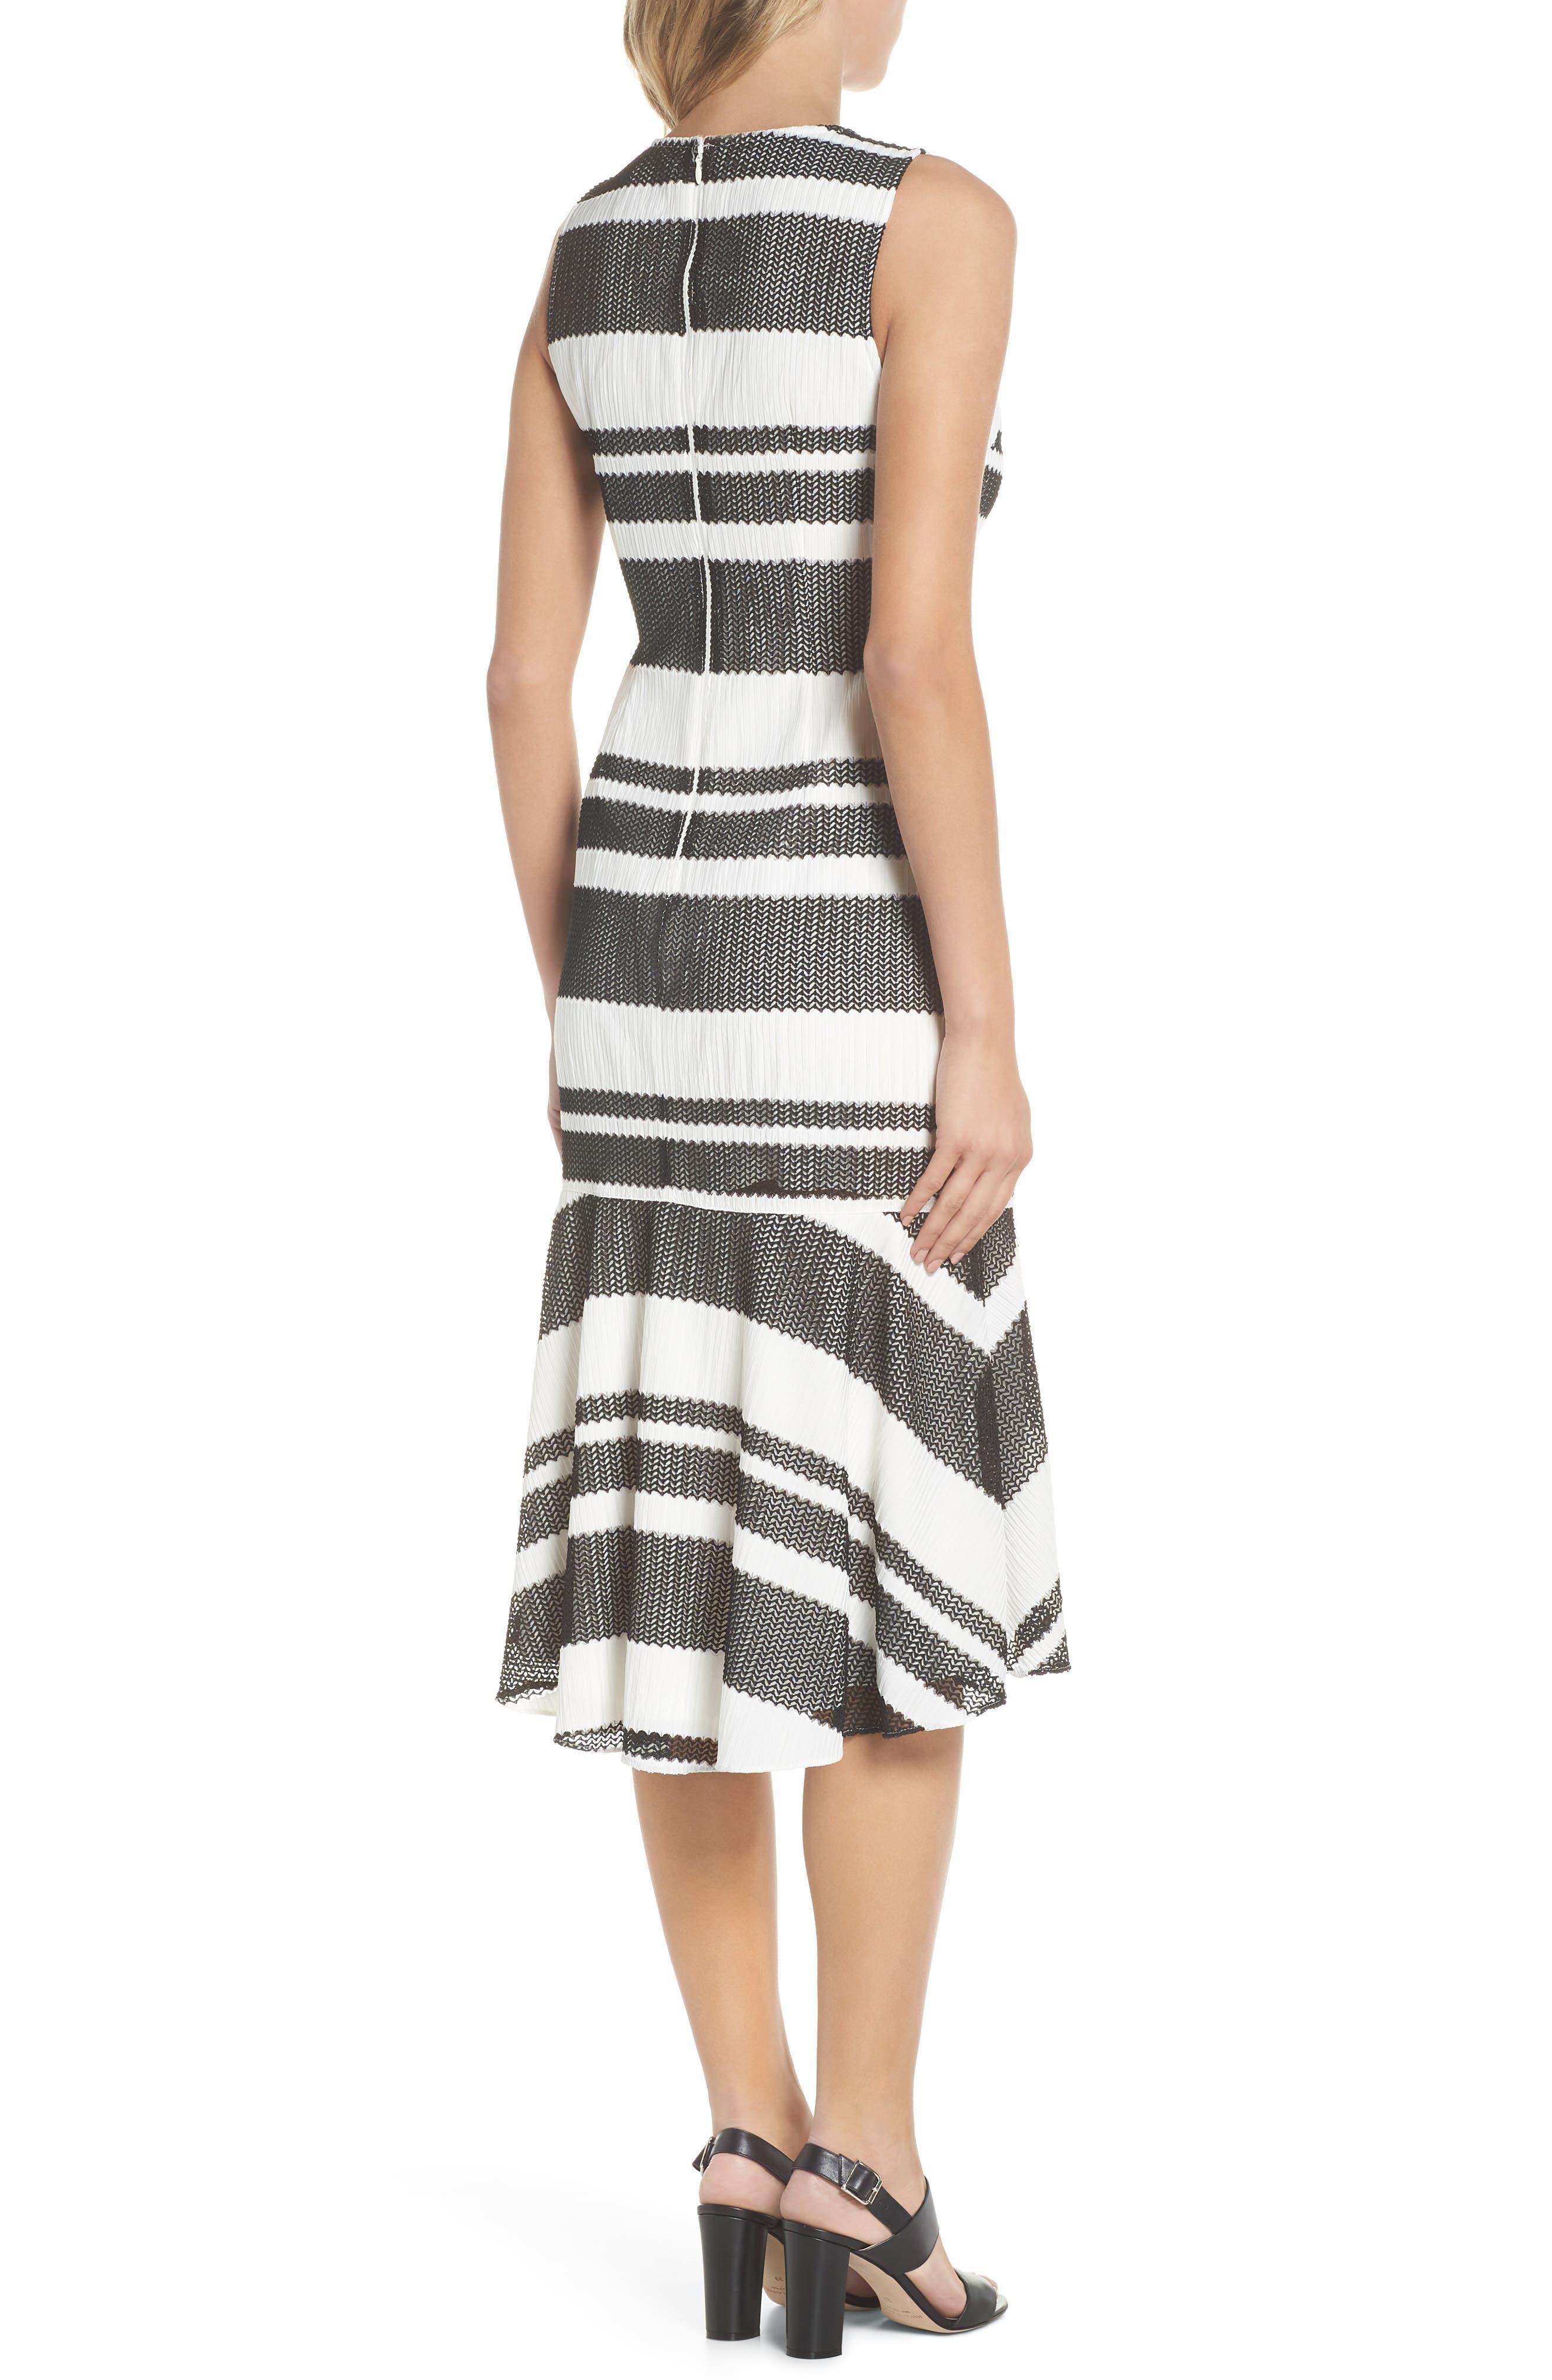 ADRIANNA PAPELL,                             Sleeveless Stripe Trumpet Sheath Dress,                             Alternate thumbnail 2, color,                             004